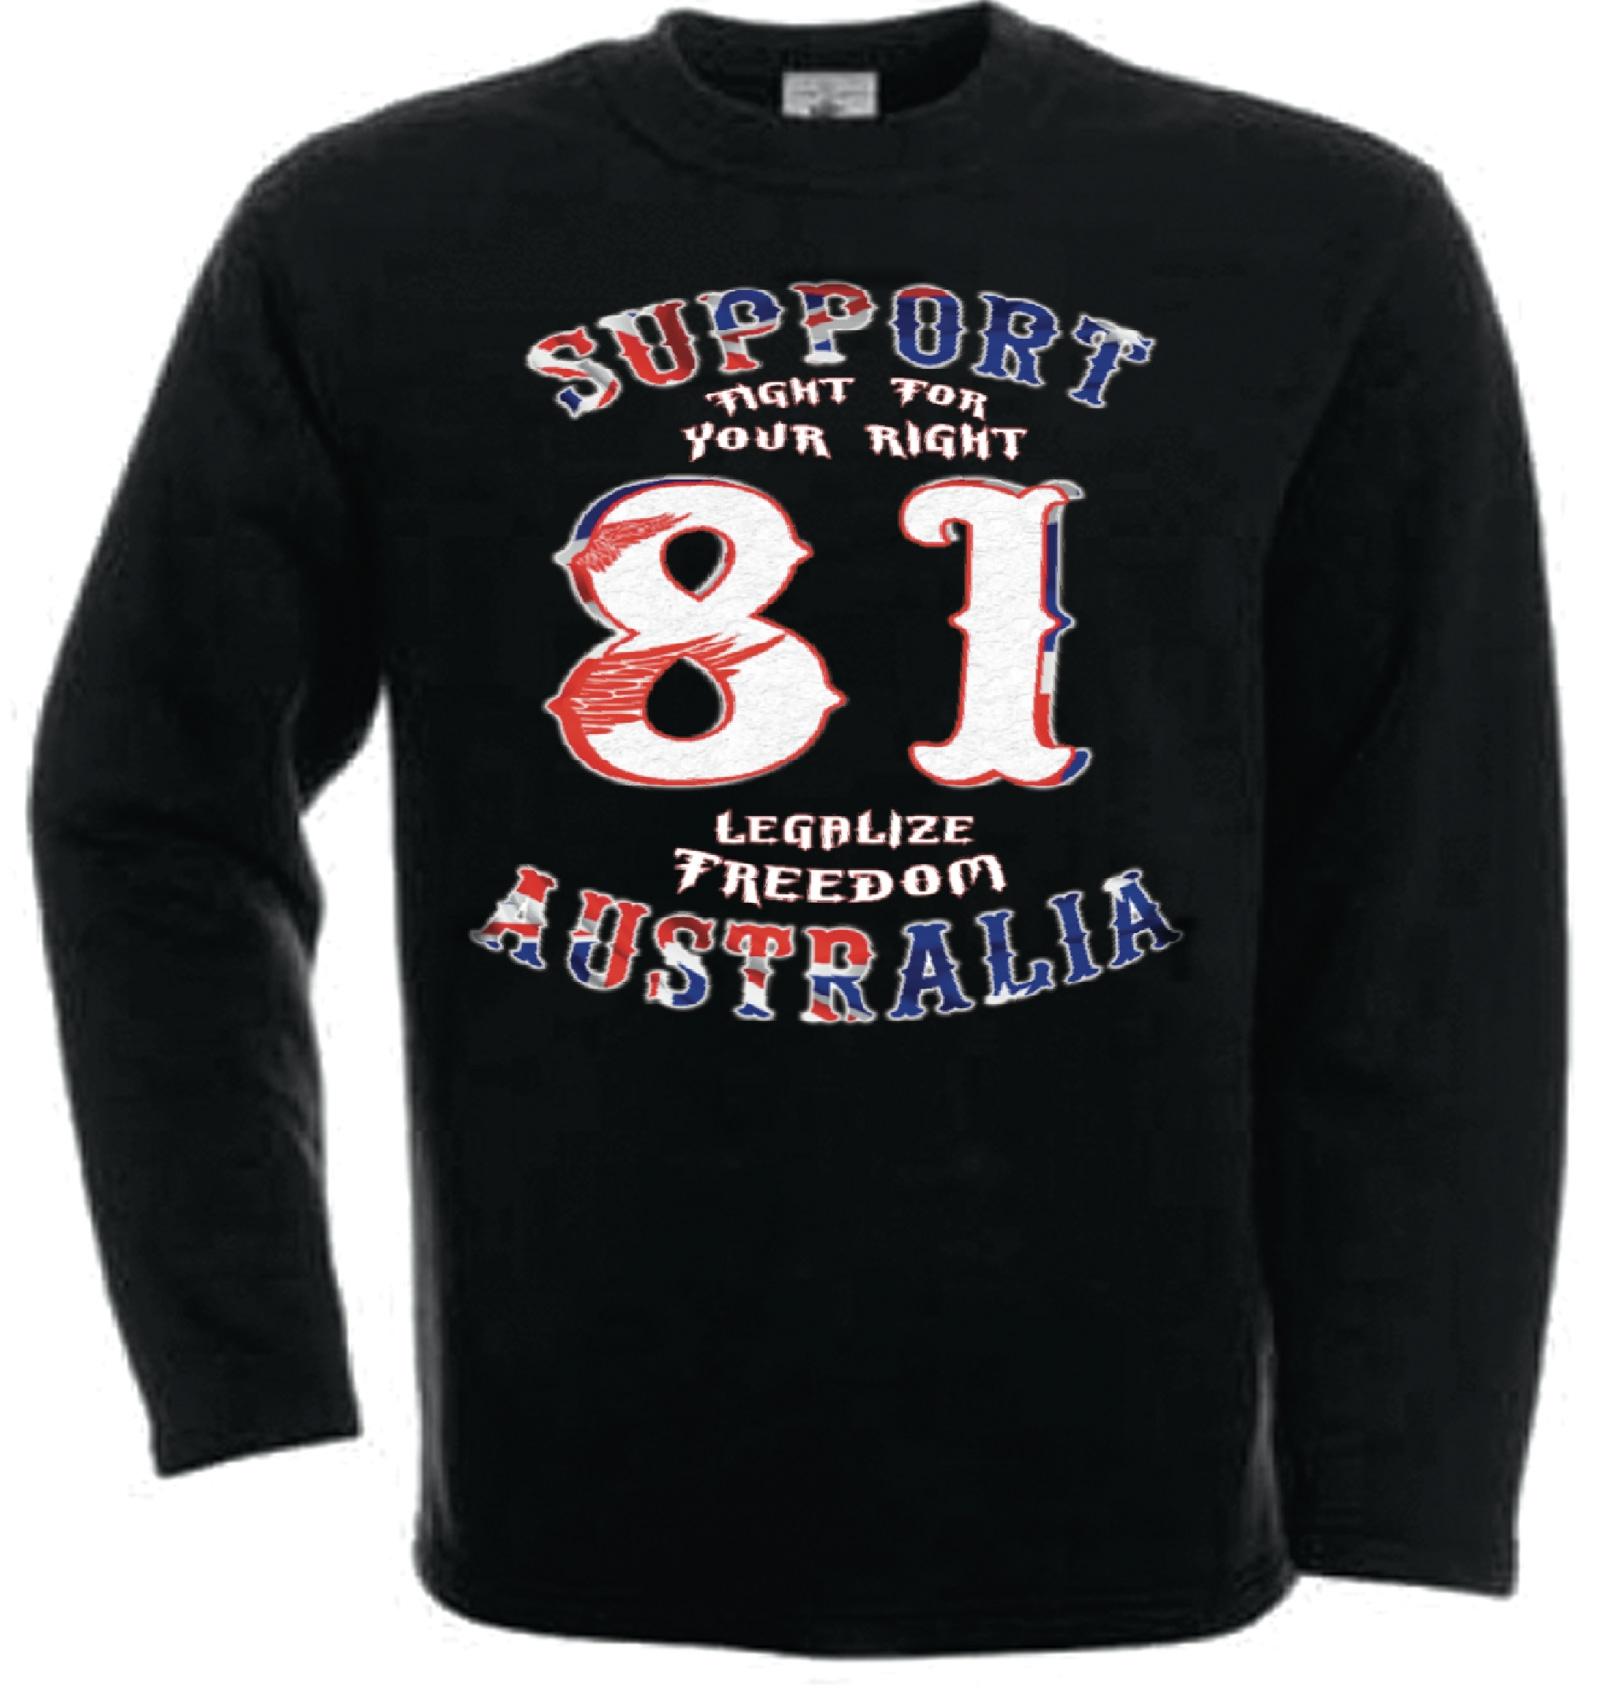 49 hells angels australia bhc freedom support81 sweatshirt. Black Bedroom Furniture Sets. Home Design Ideas